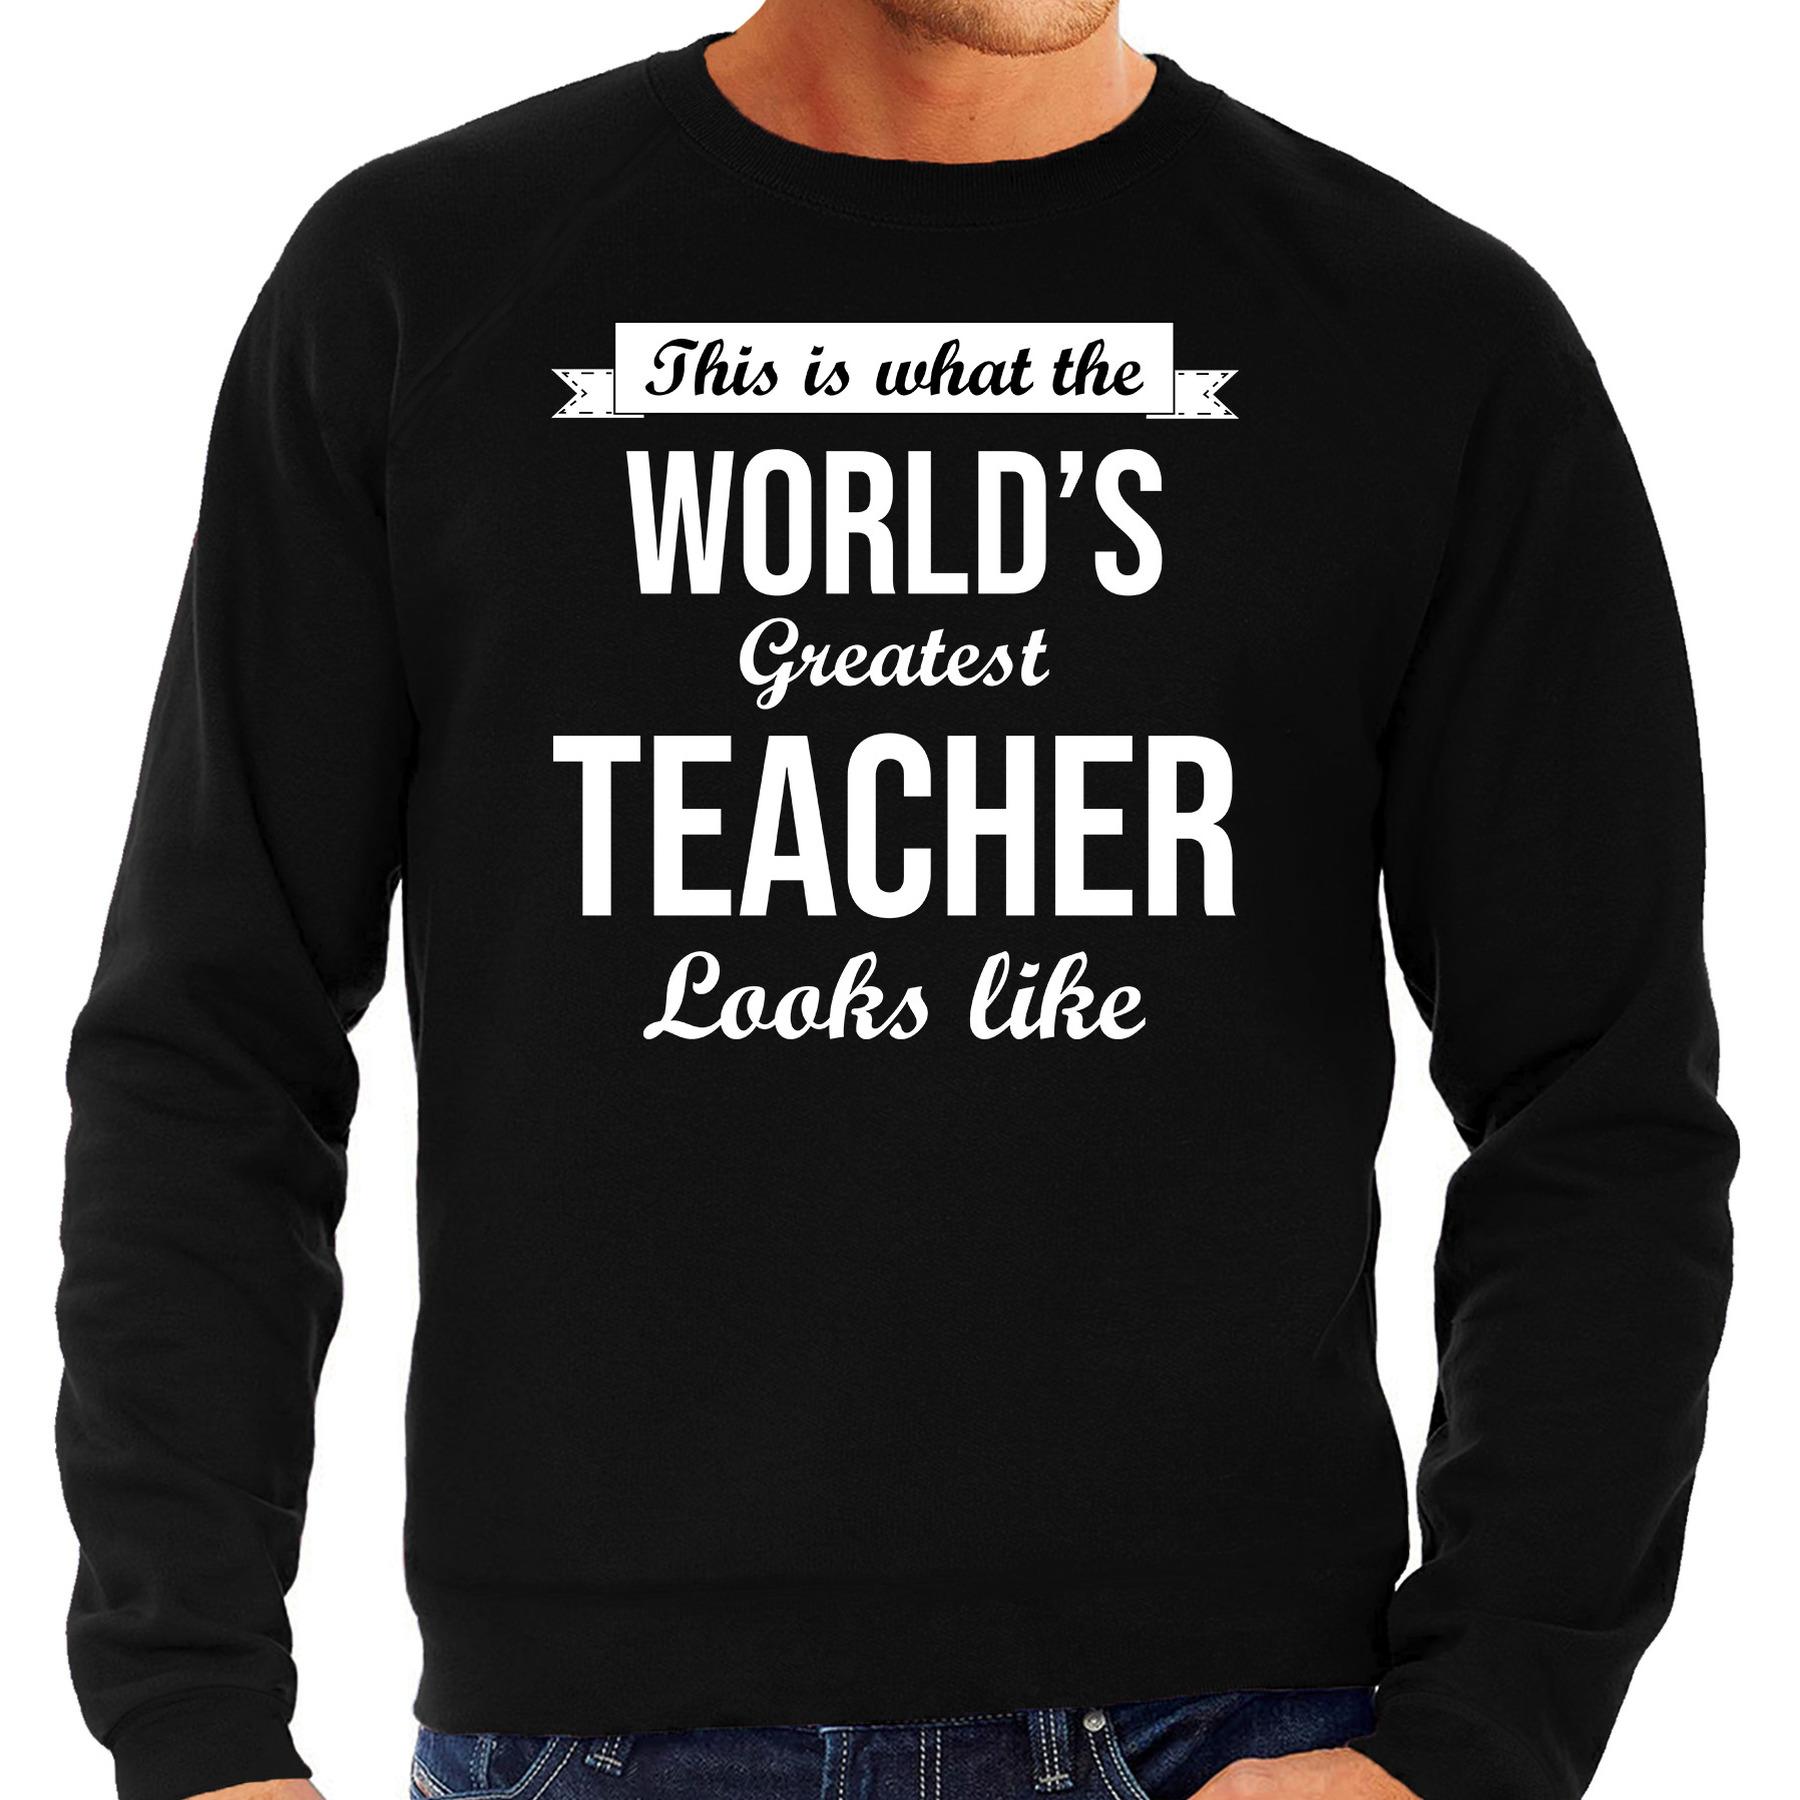 Worlds greatest teacher cadeau sweater zwart voor heren